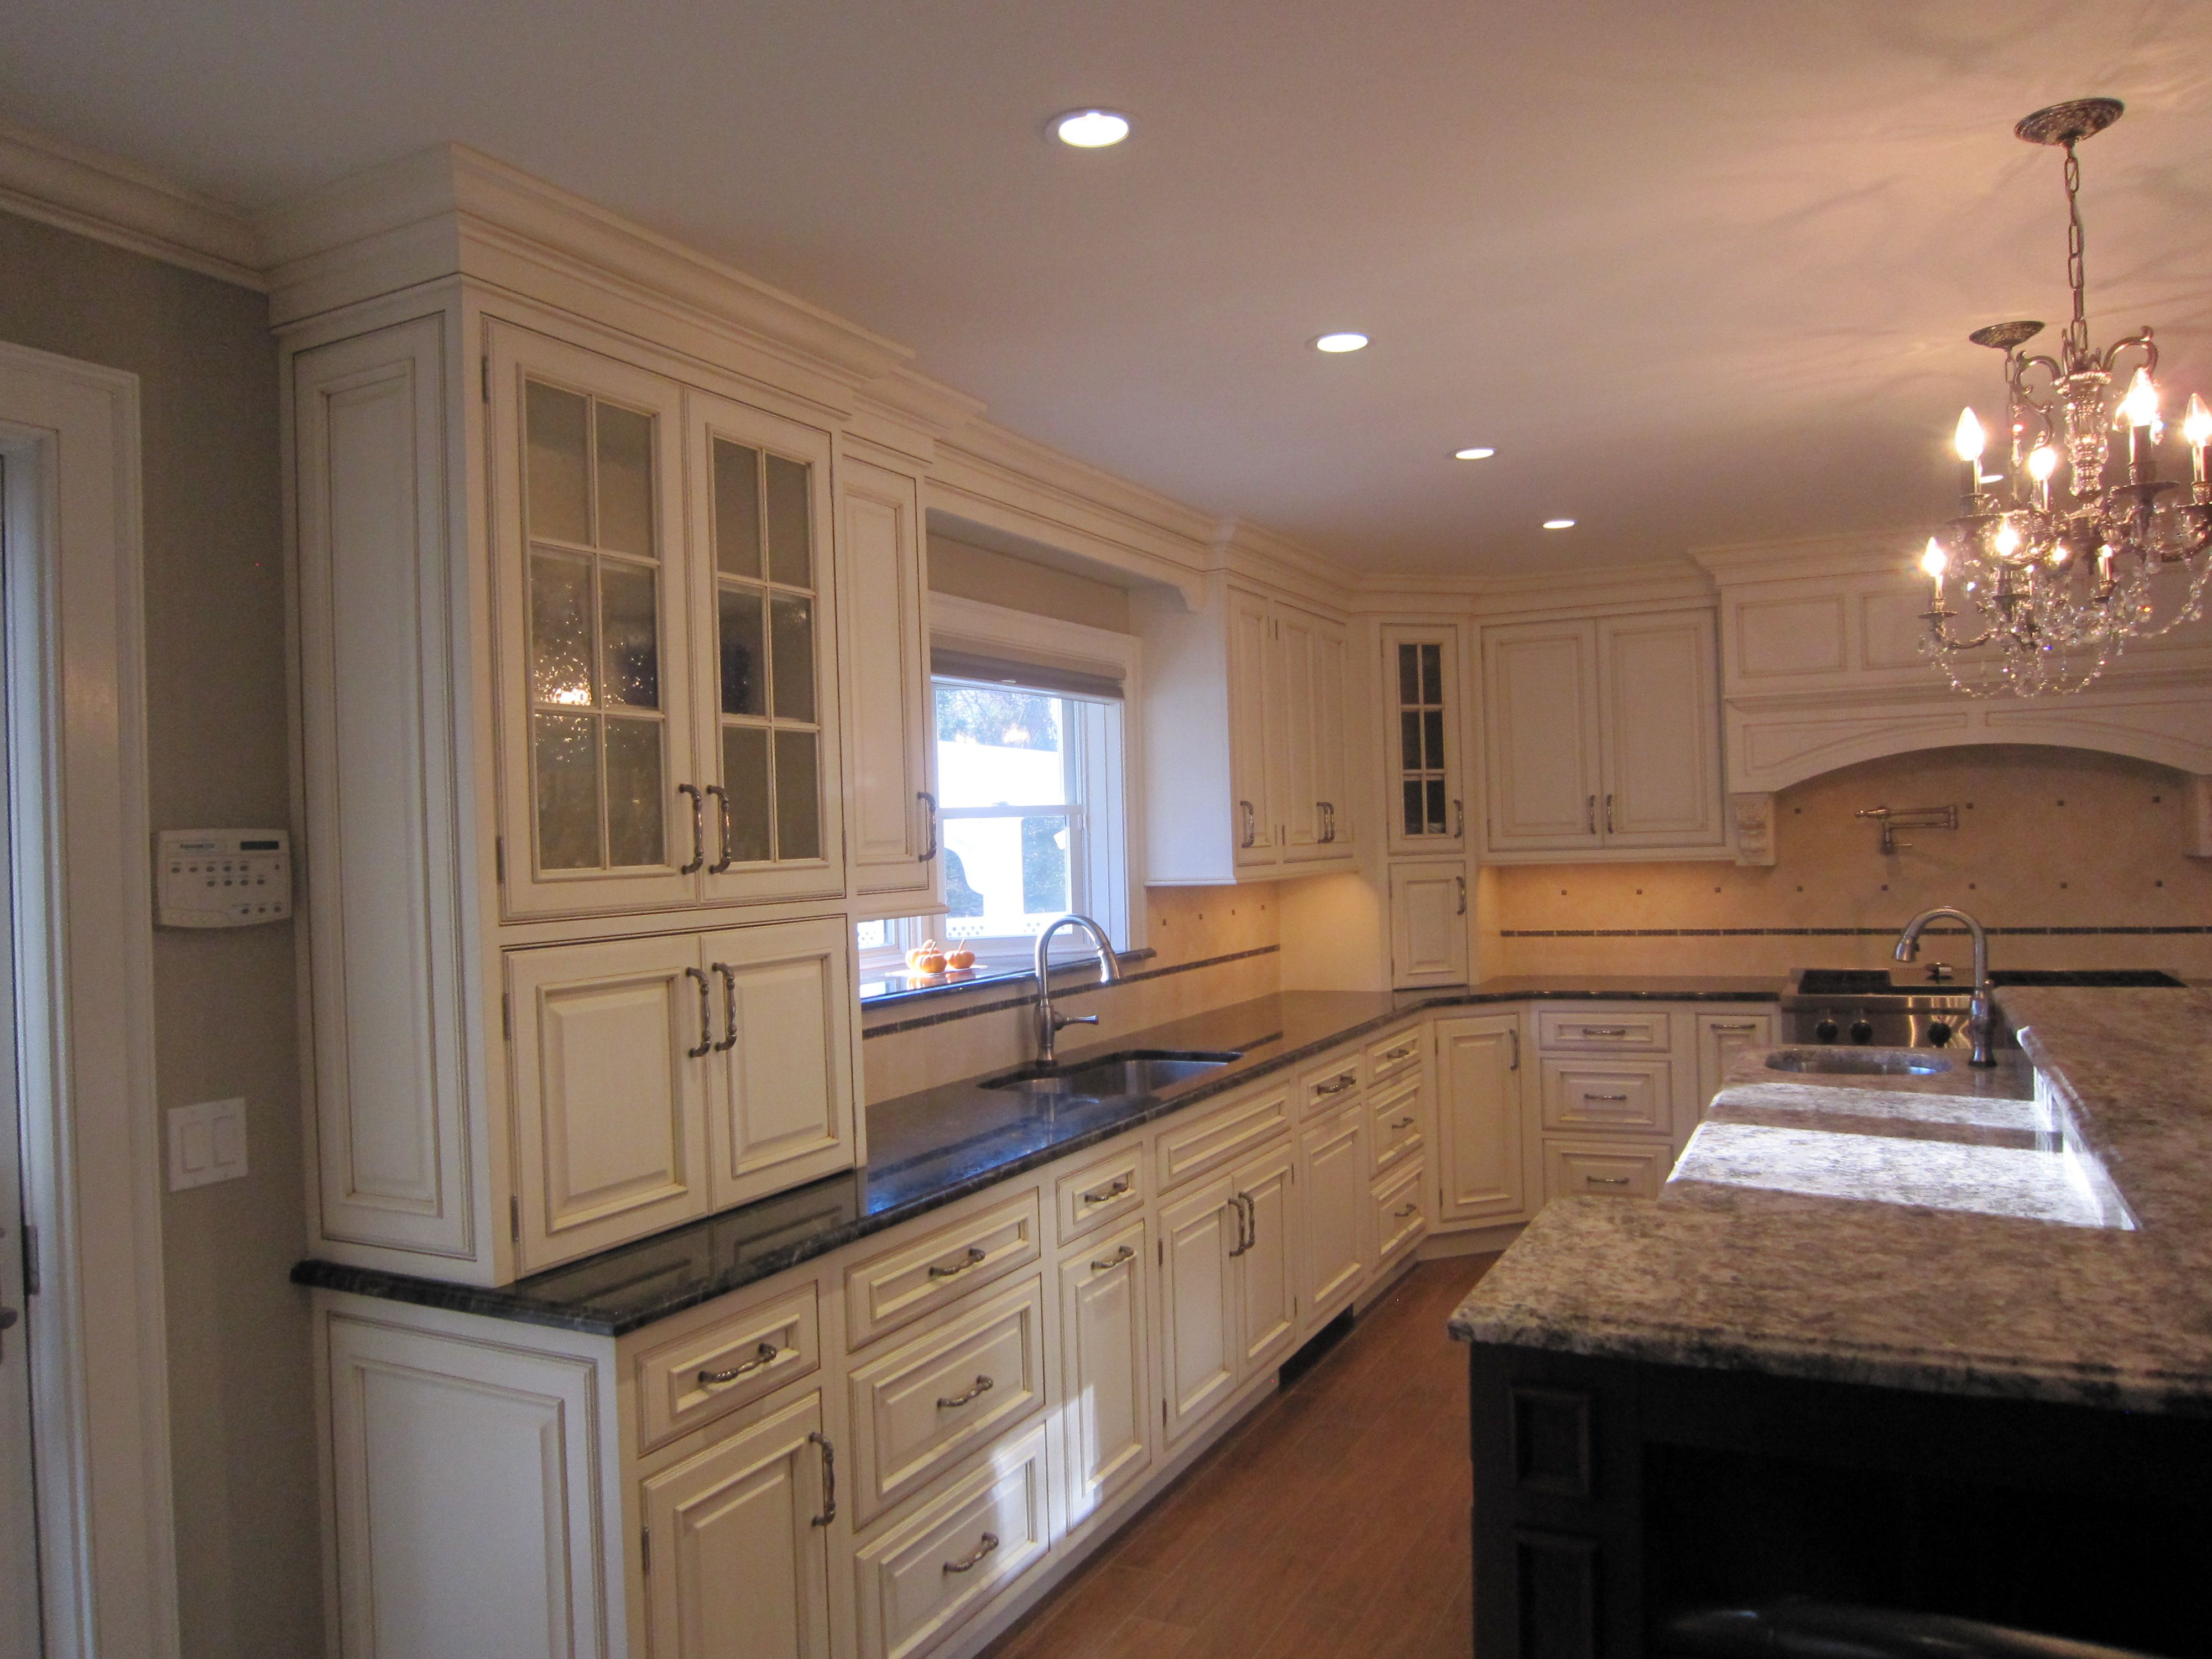 Etonnant Majestic Kitchens And Bath Designer: Vincent Carilli Plain U0026 Fancy  Cabinetry   Kent Raised Panel